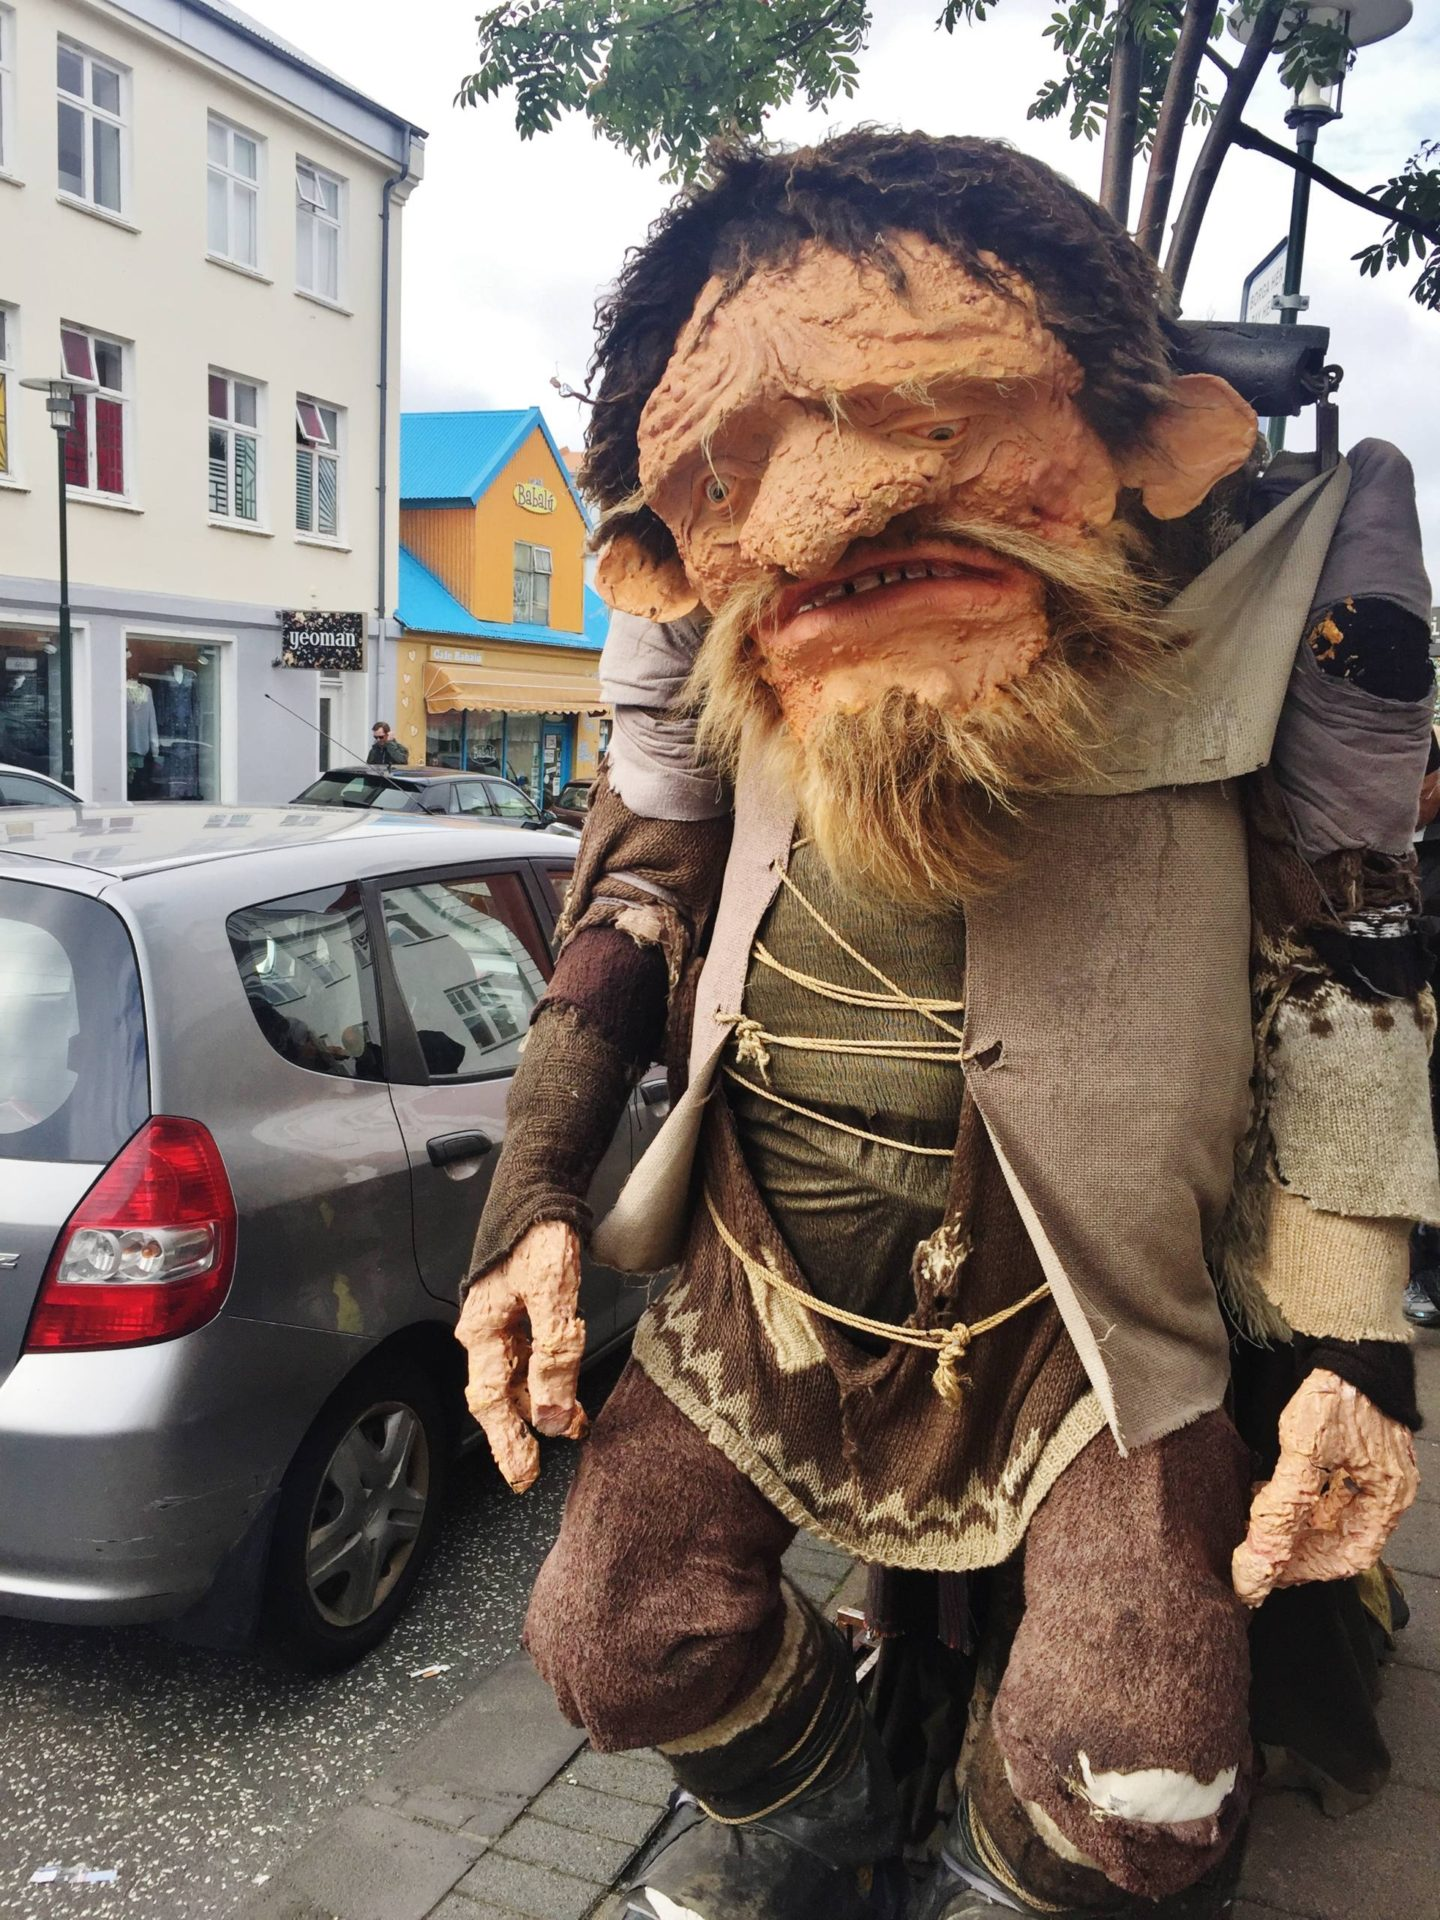 Emma Victoria Stokes Reykjavik Icelandic Trolls